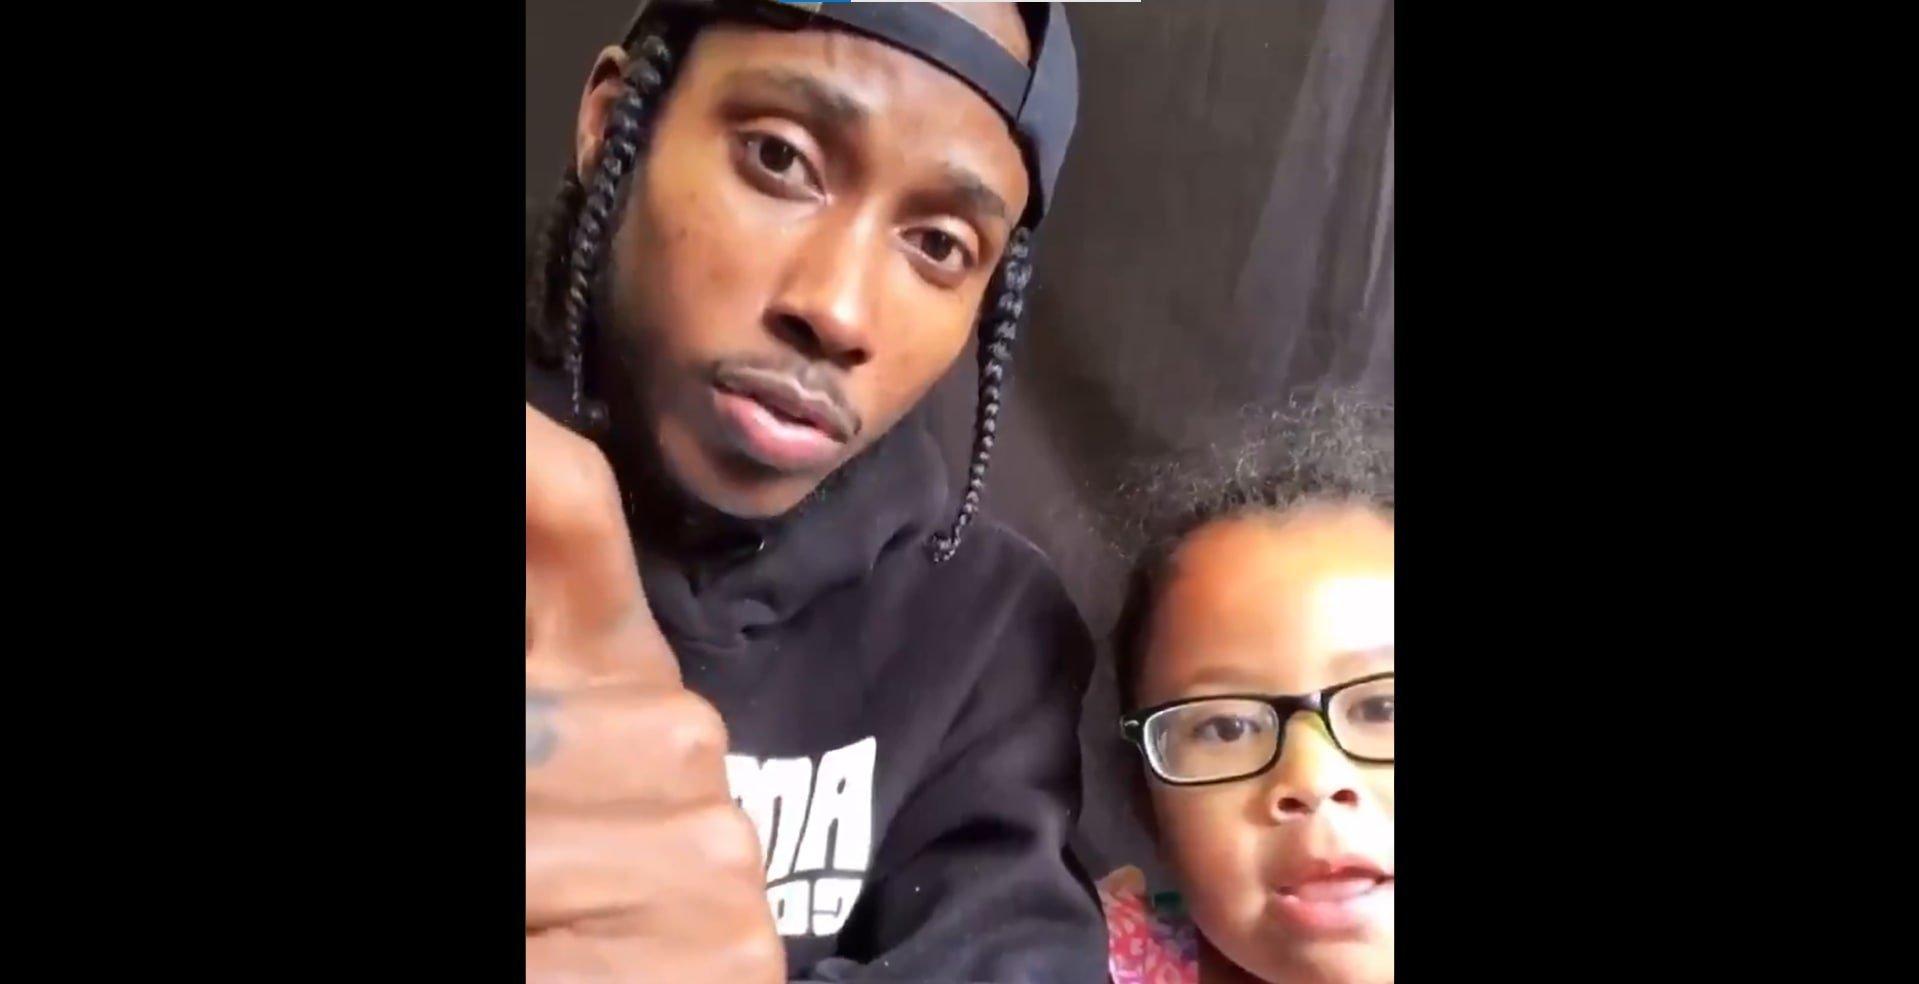 Black dad's rant slamming critical race theory goes viral